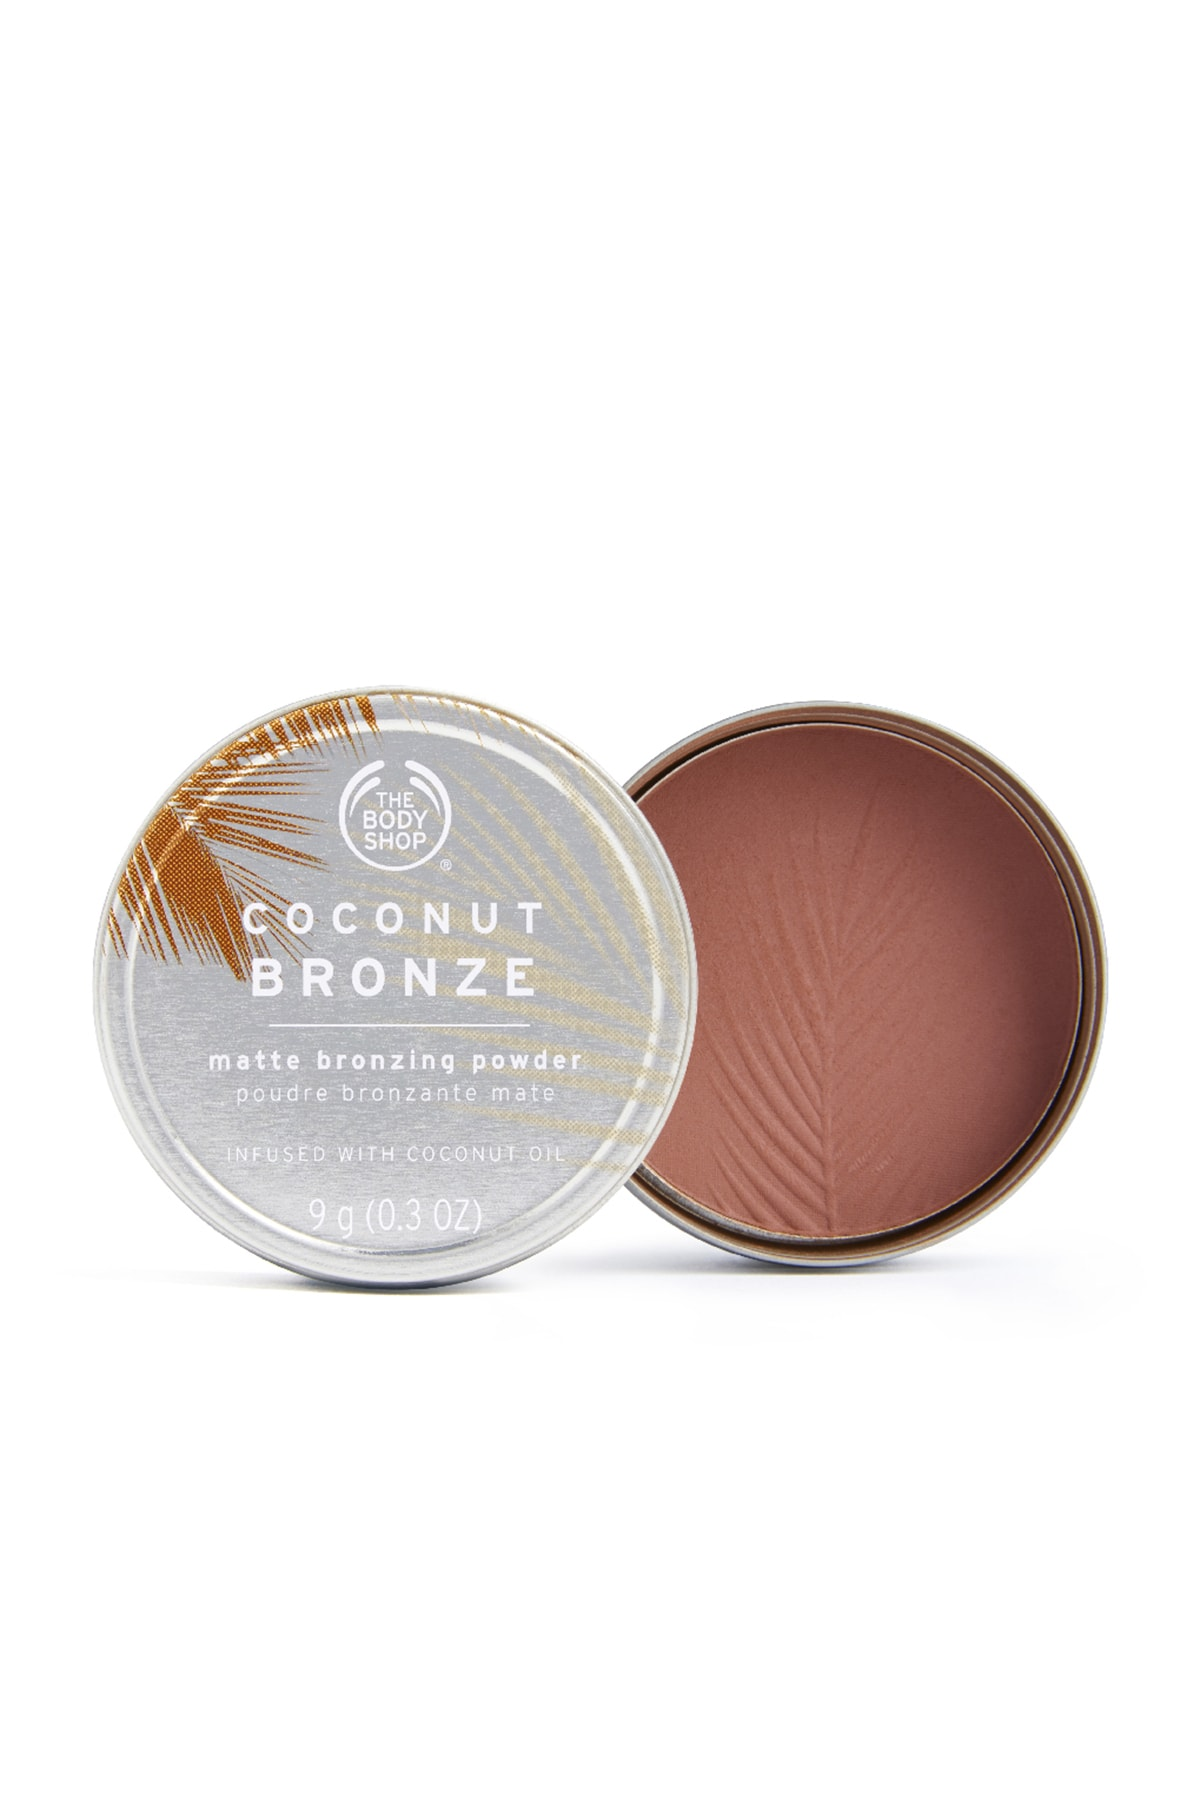 THE BODY SHOP Coconut Bronze Mat Bronz Pudra Dark 9 G 5028197893842